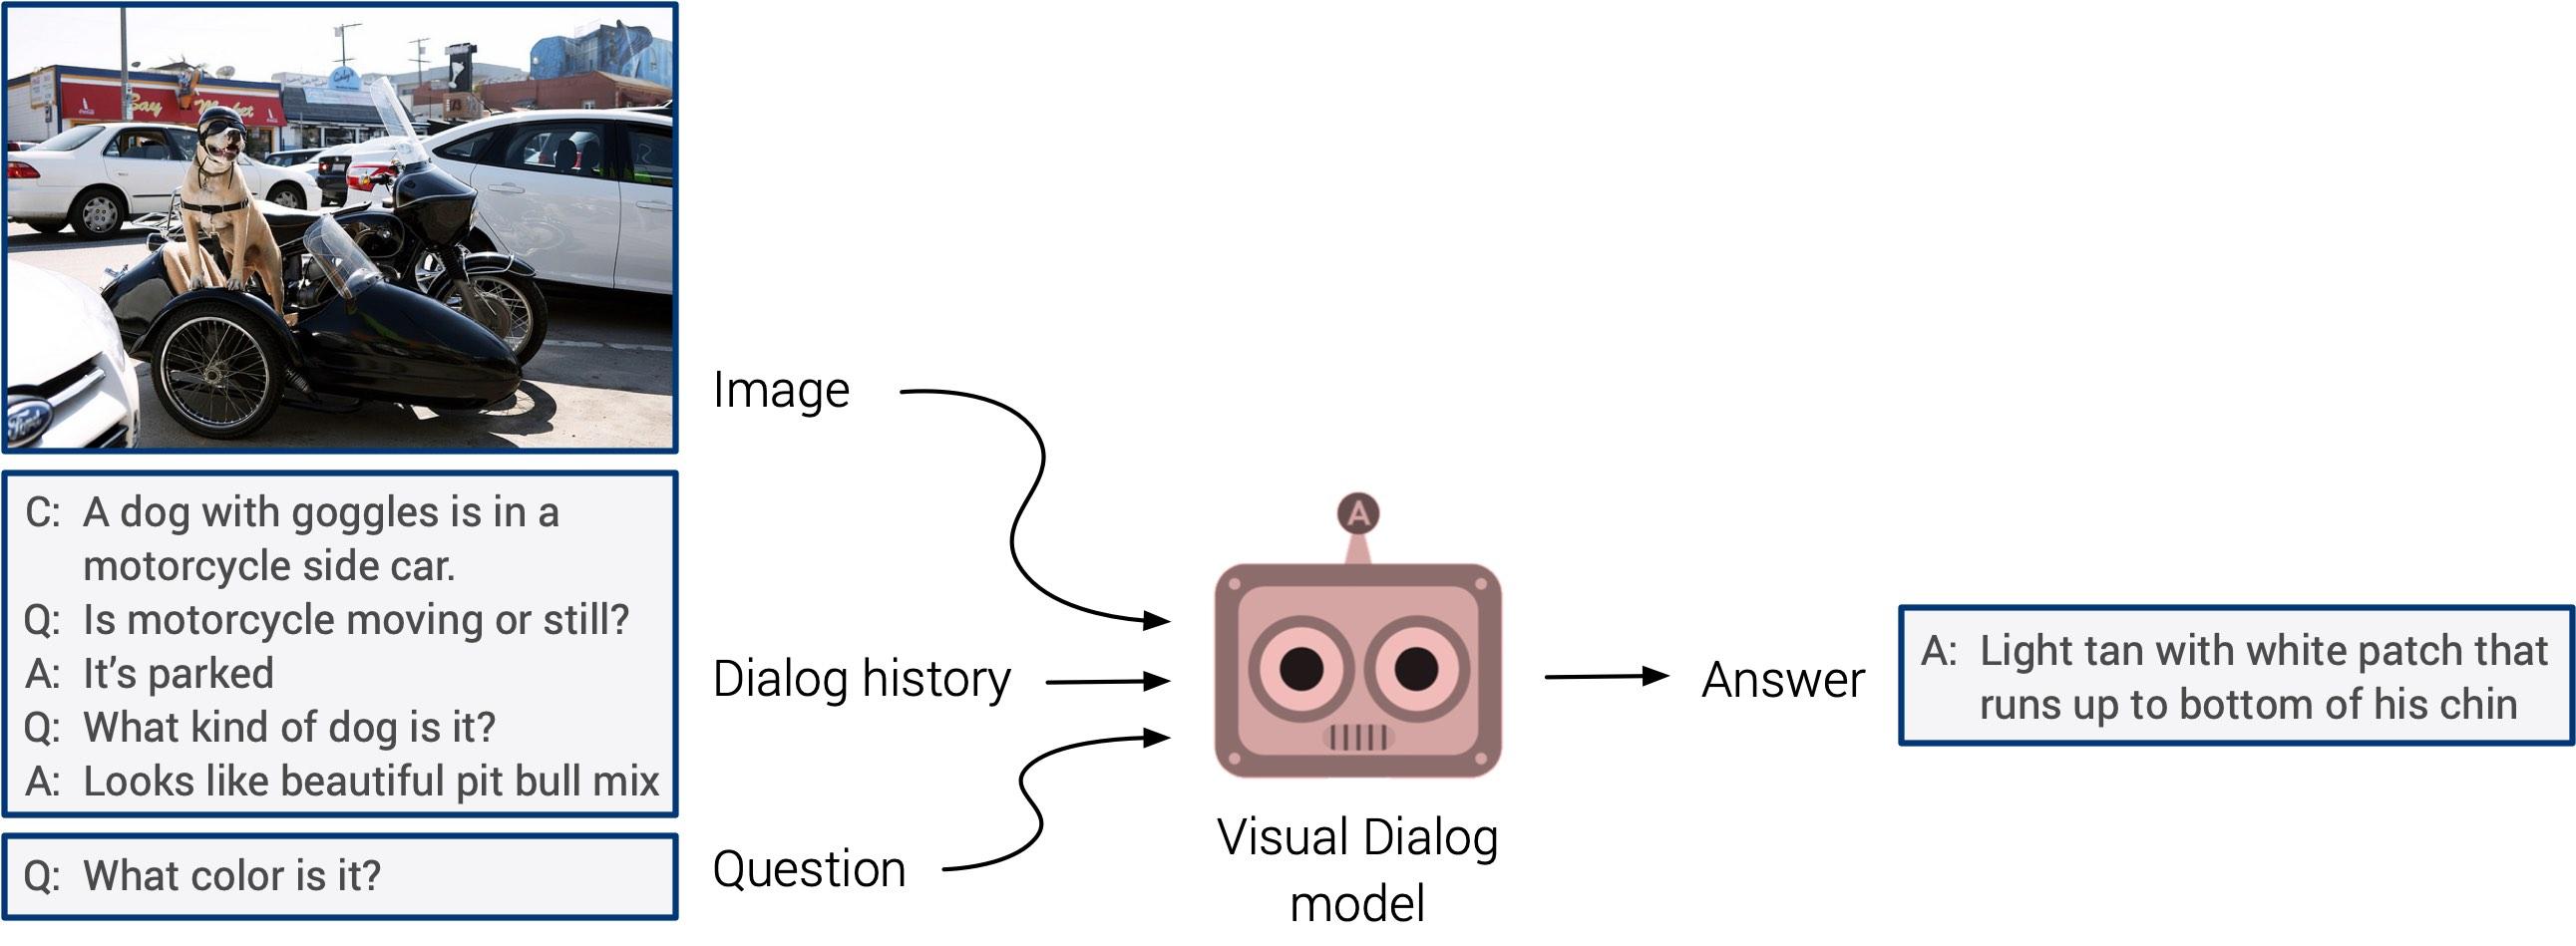 visual dialog